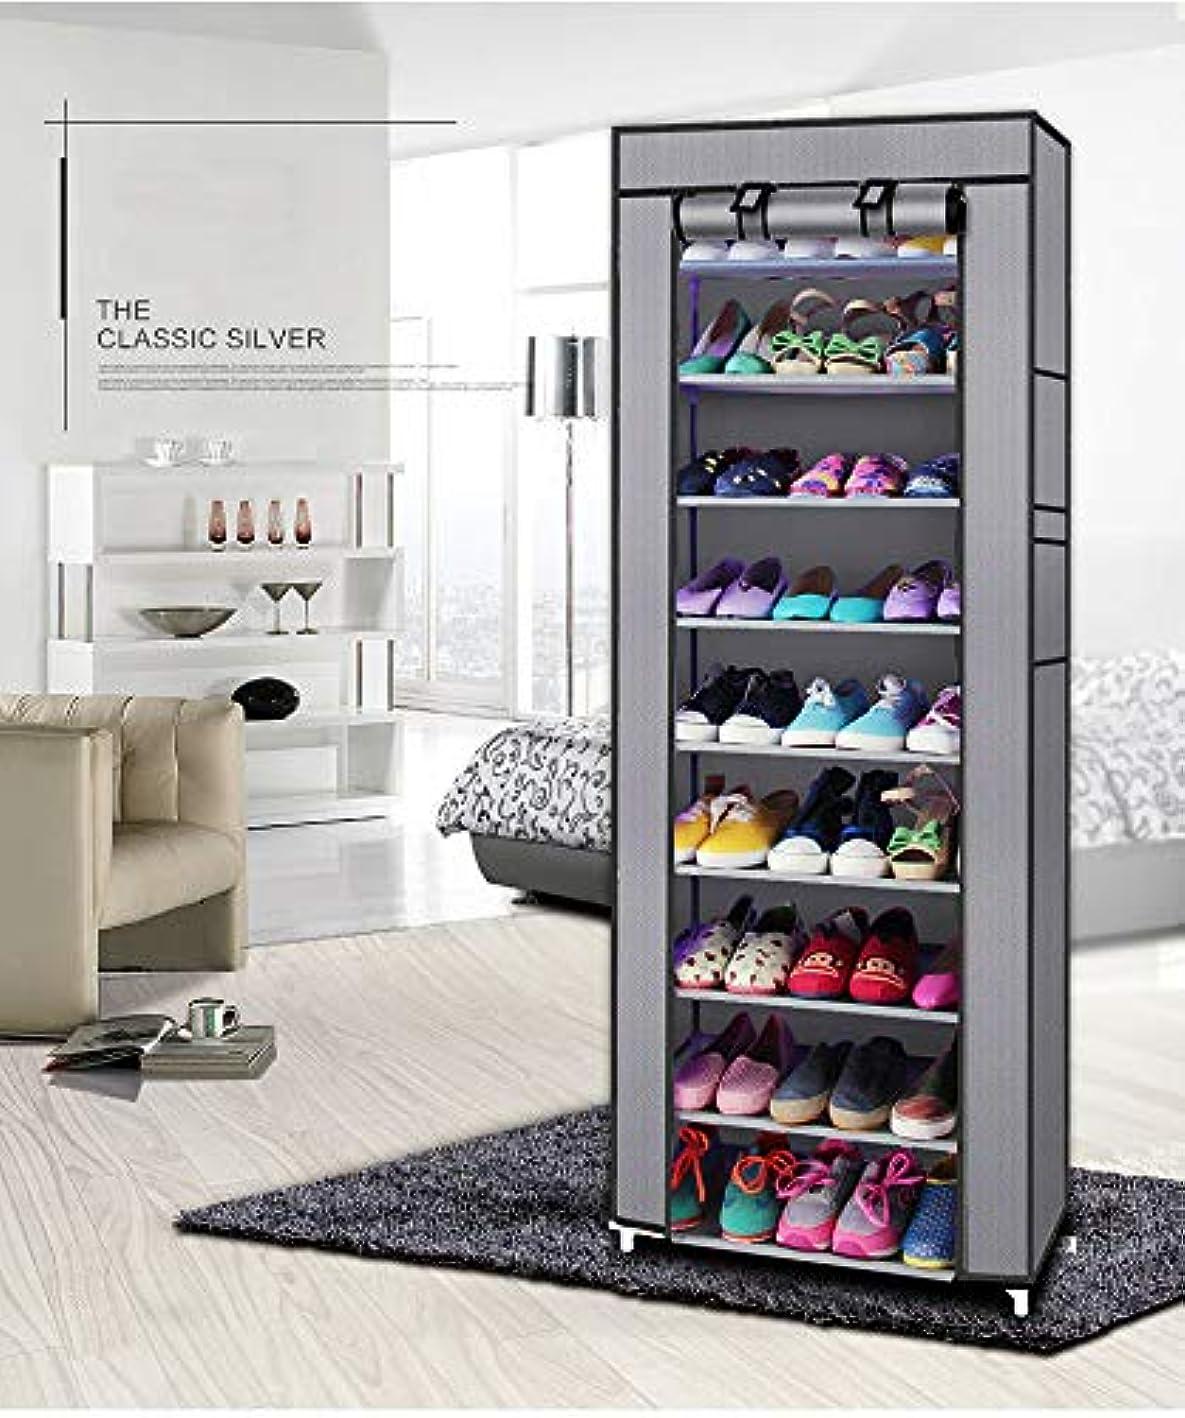 poppip 10 Layer Shoe Rack Shelf Storage Closet Organizer Dustproof Cabinet w/Cover